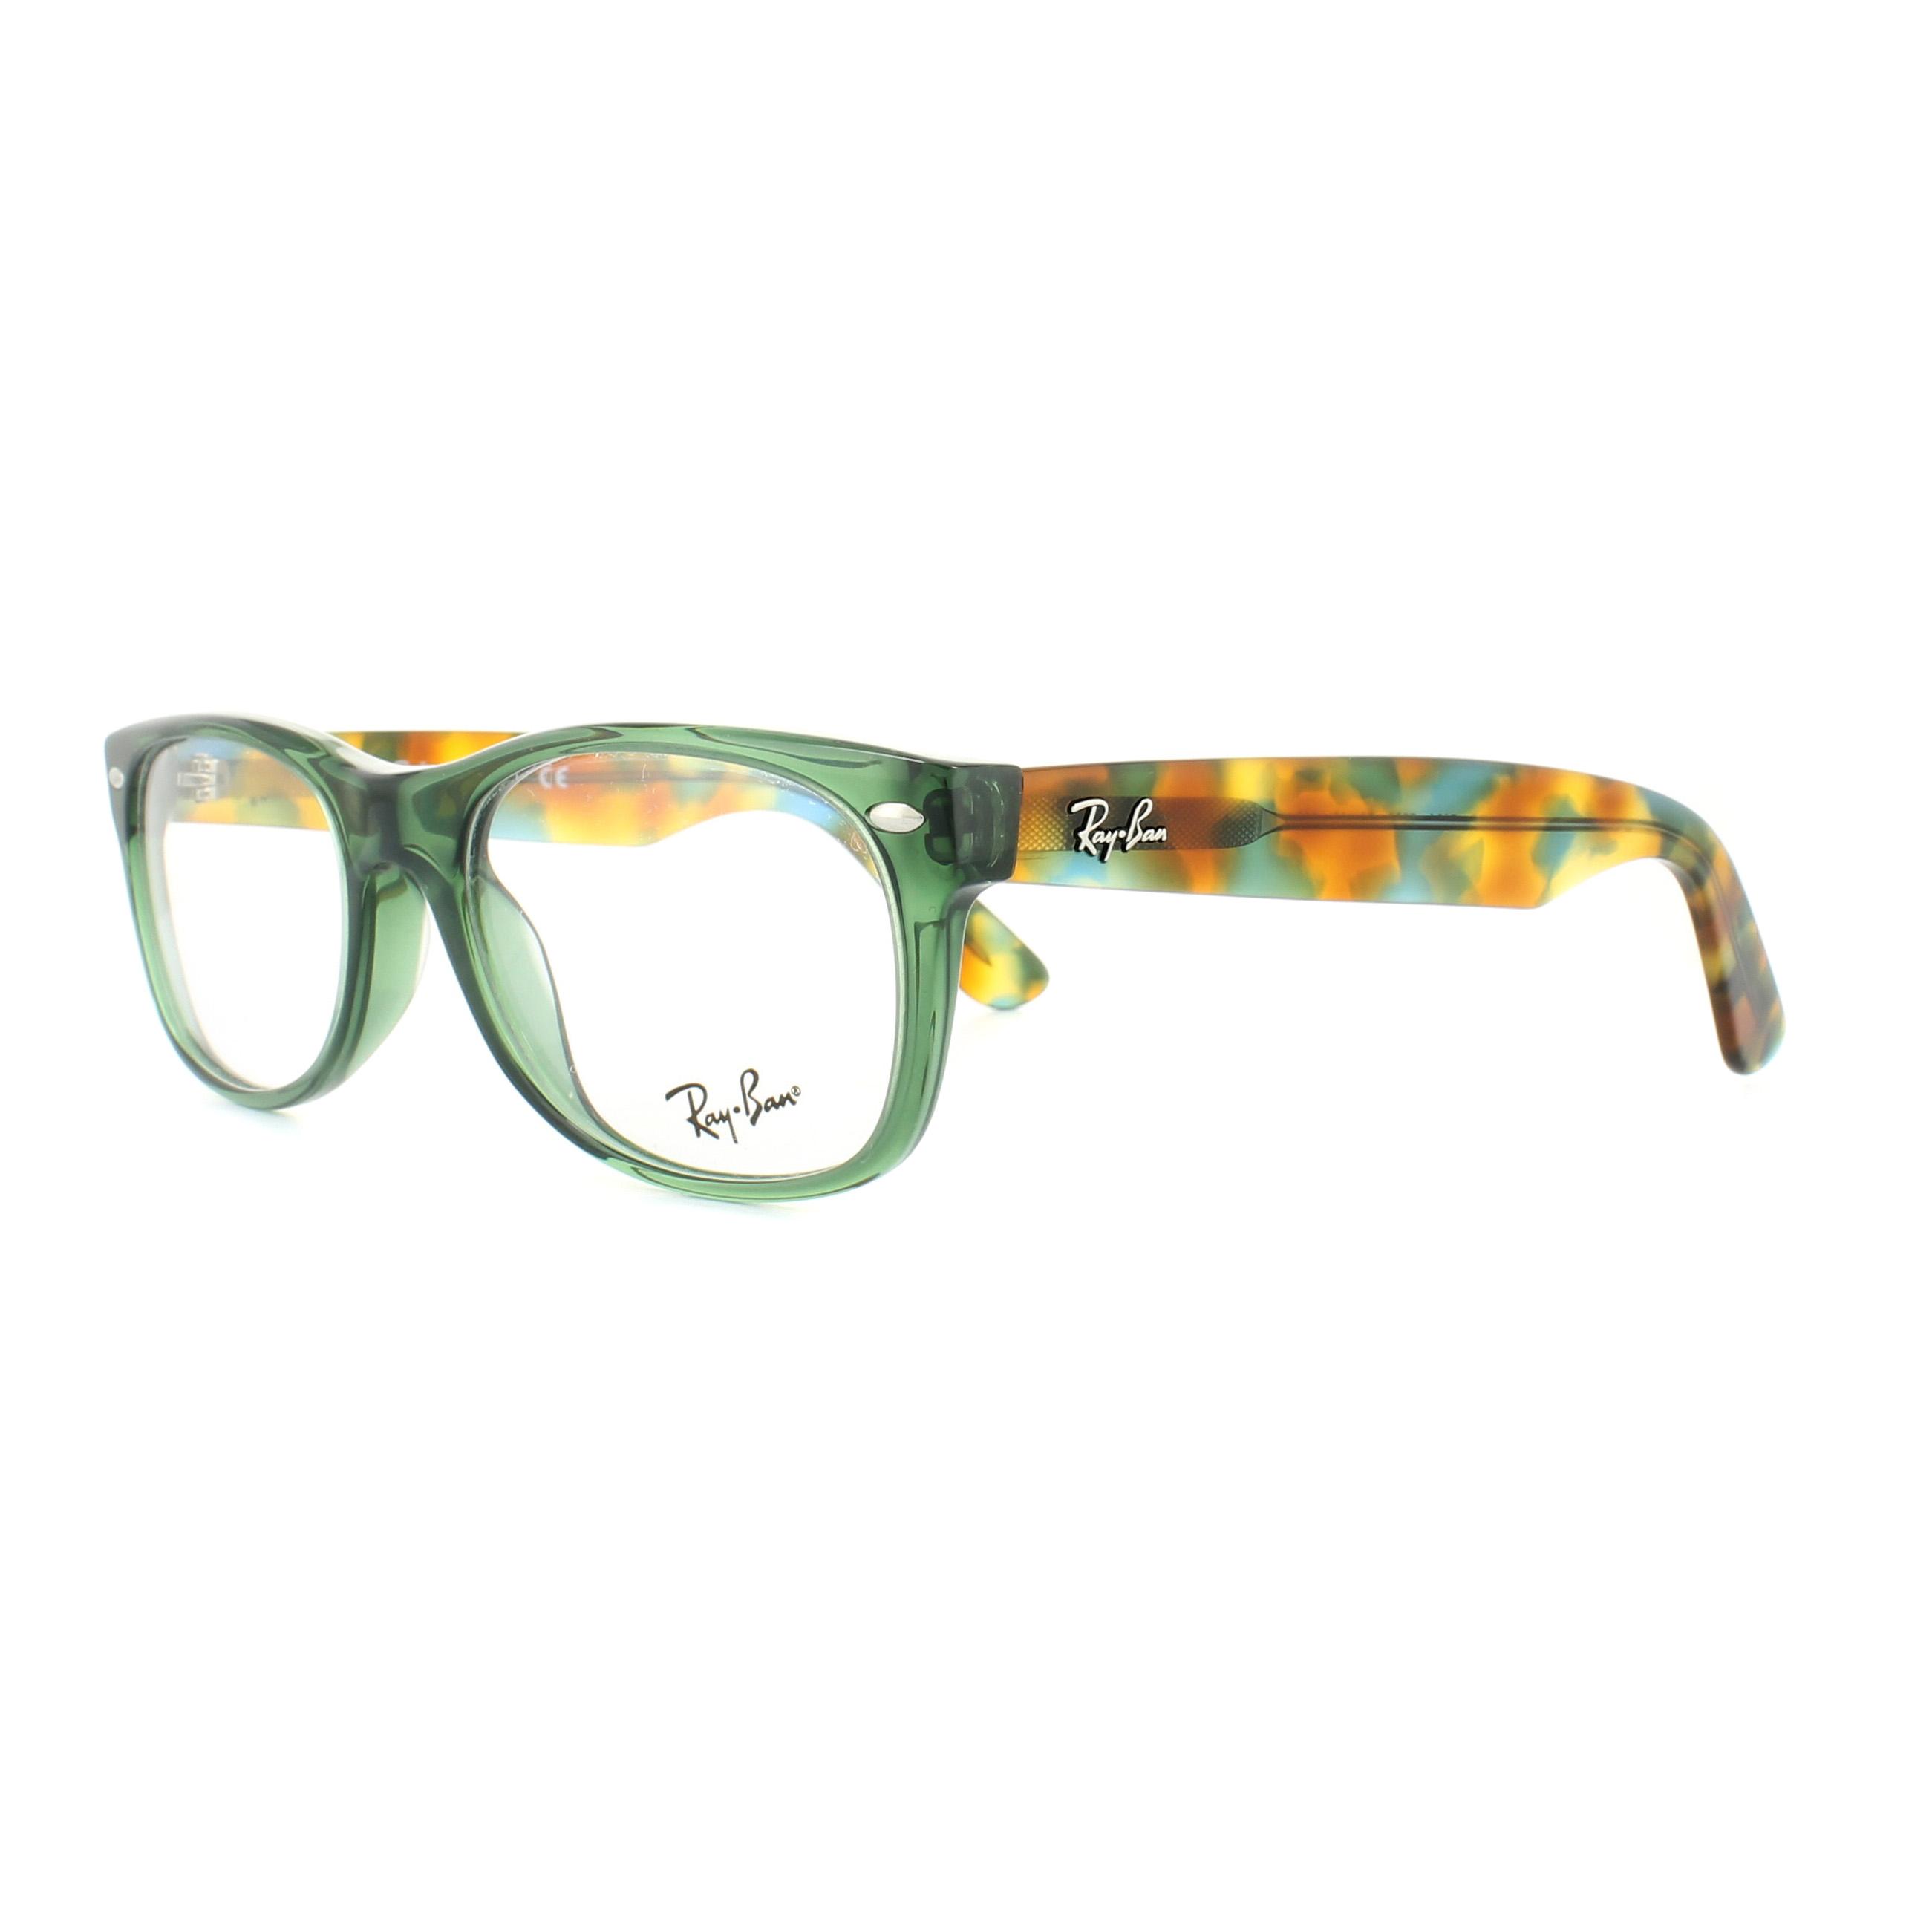 Ray-Ban Glasses Frames 5184 New Wayfarer 5630 Opal Green Tortoise ...